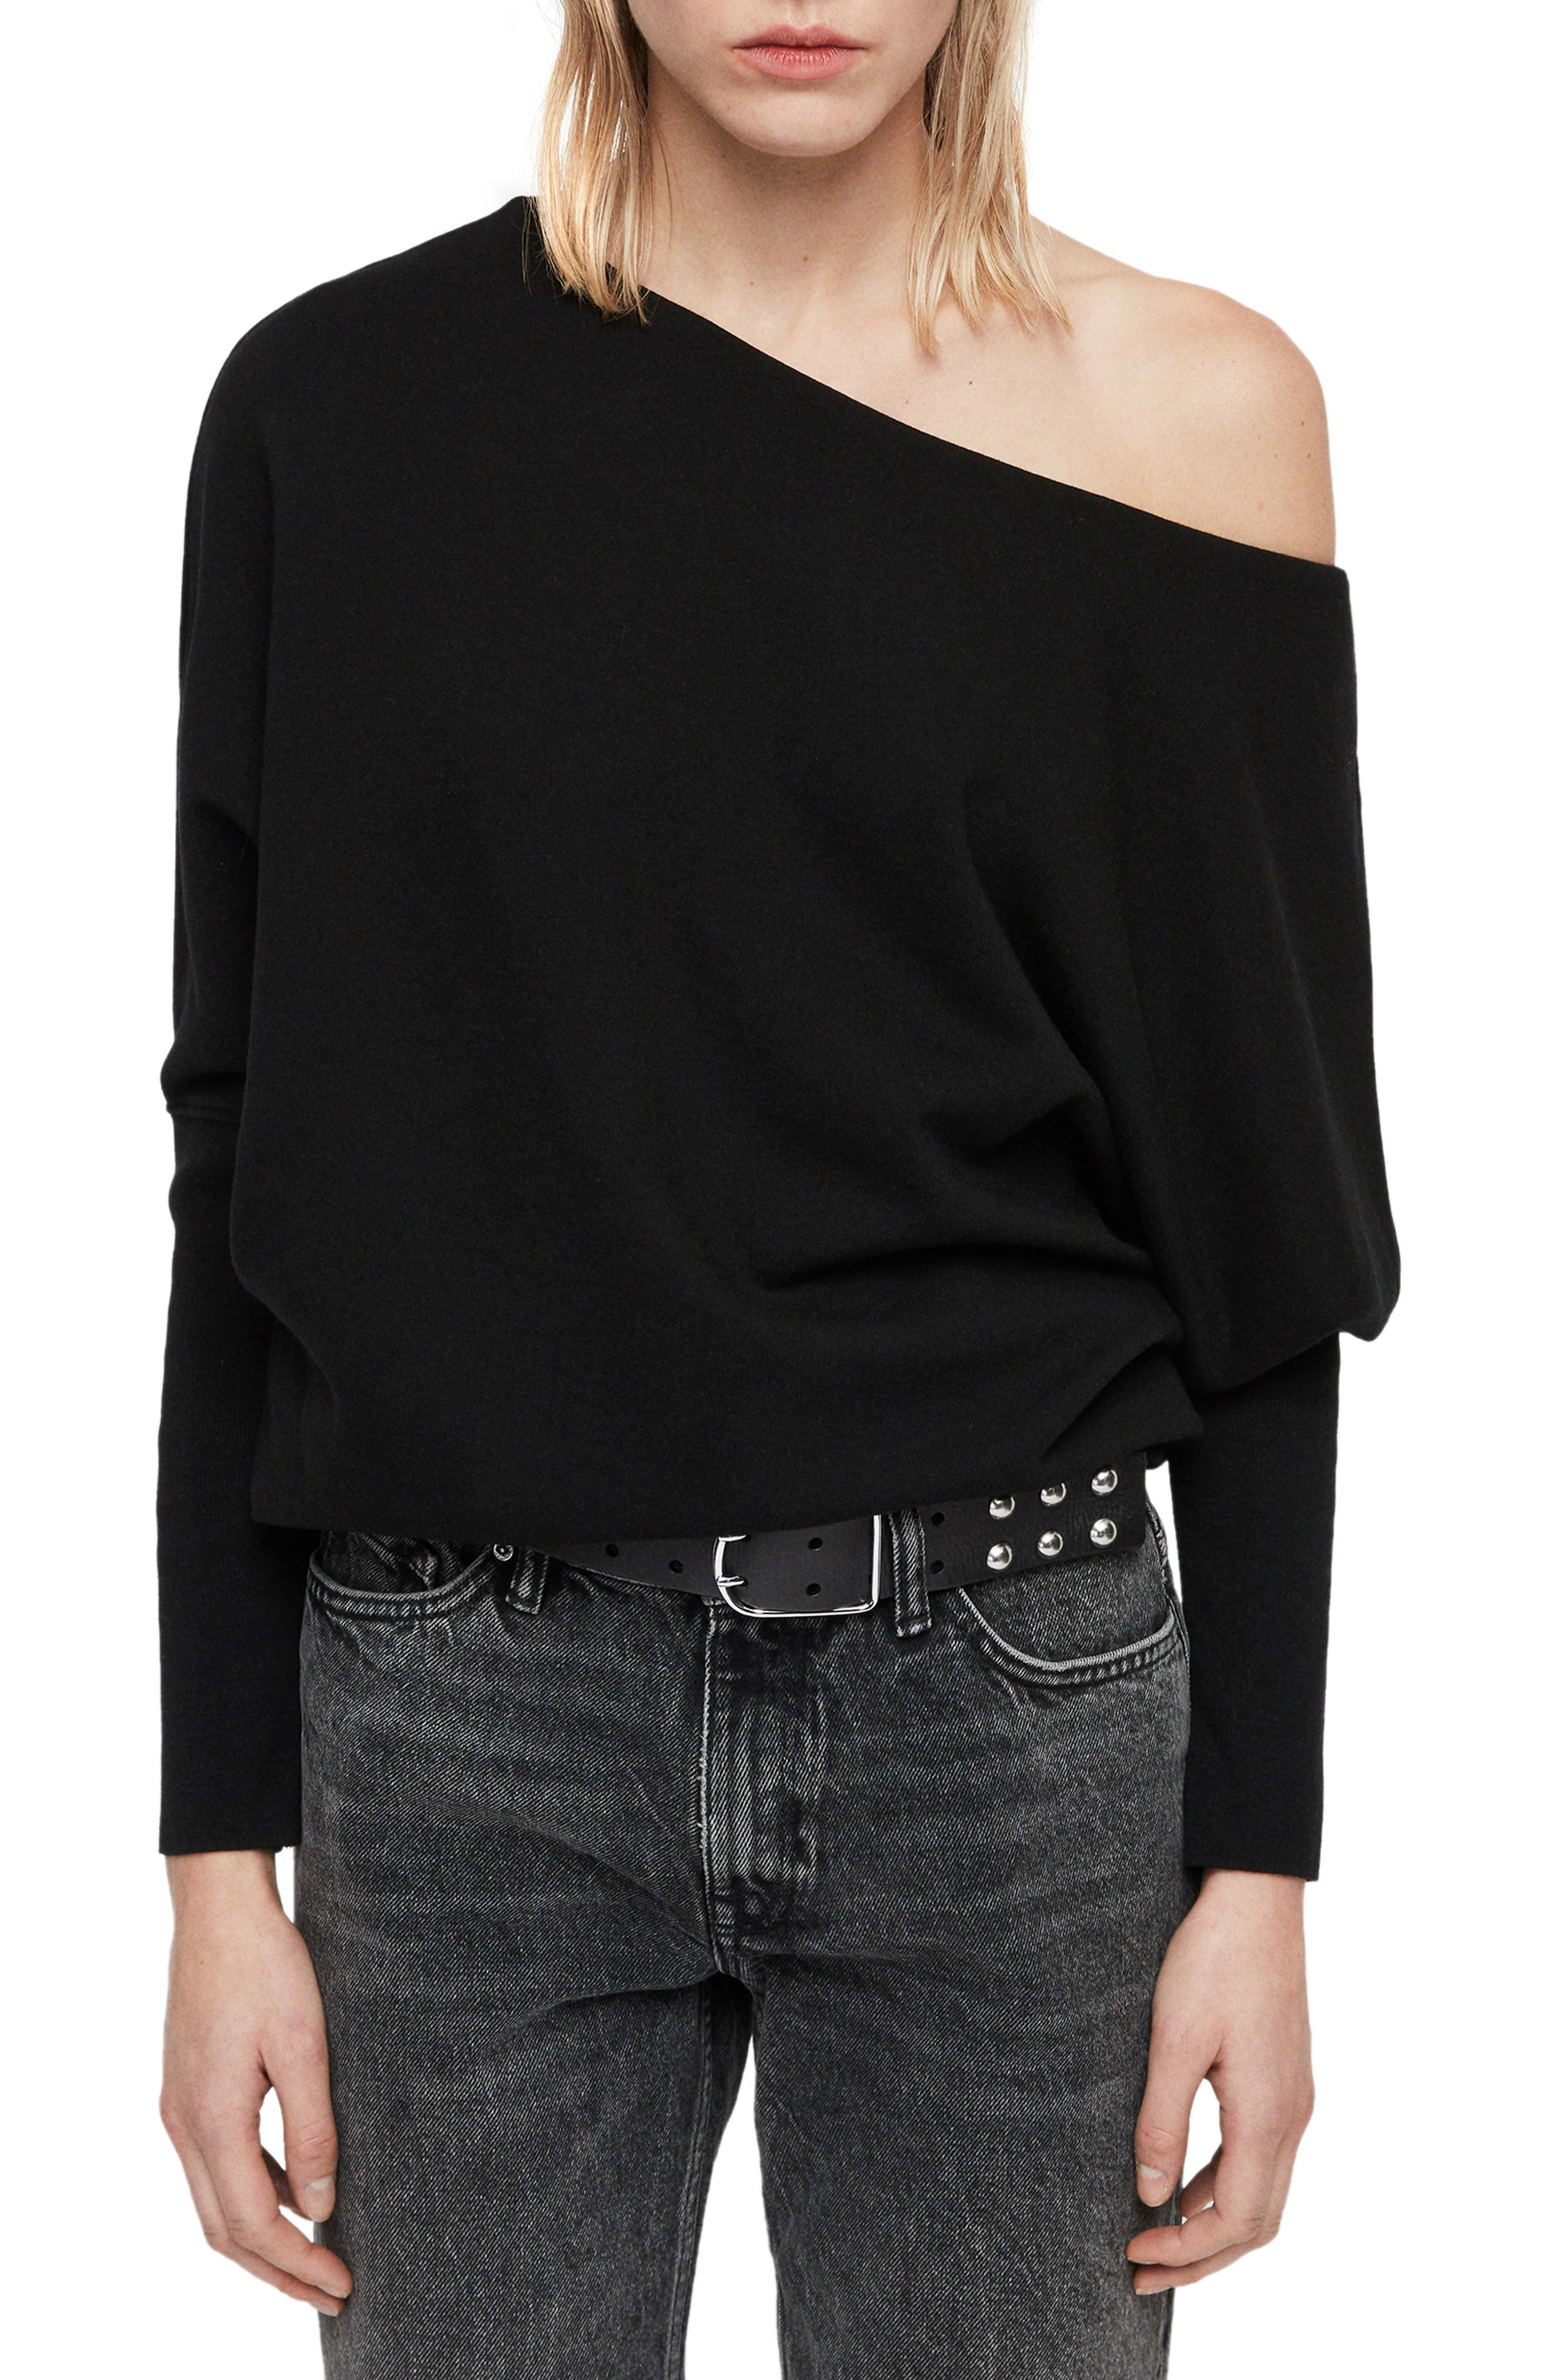 ALLSAINTS Ridley One-Shoulder Sweatshirt in Black